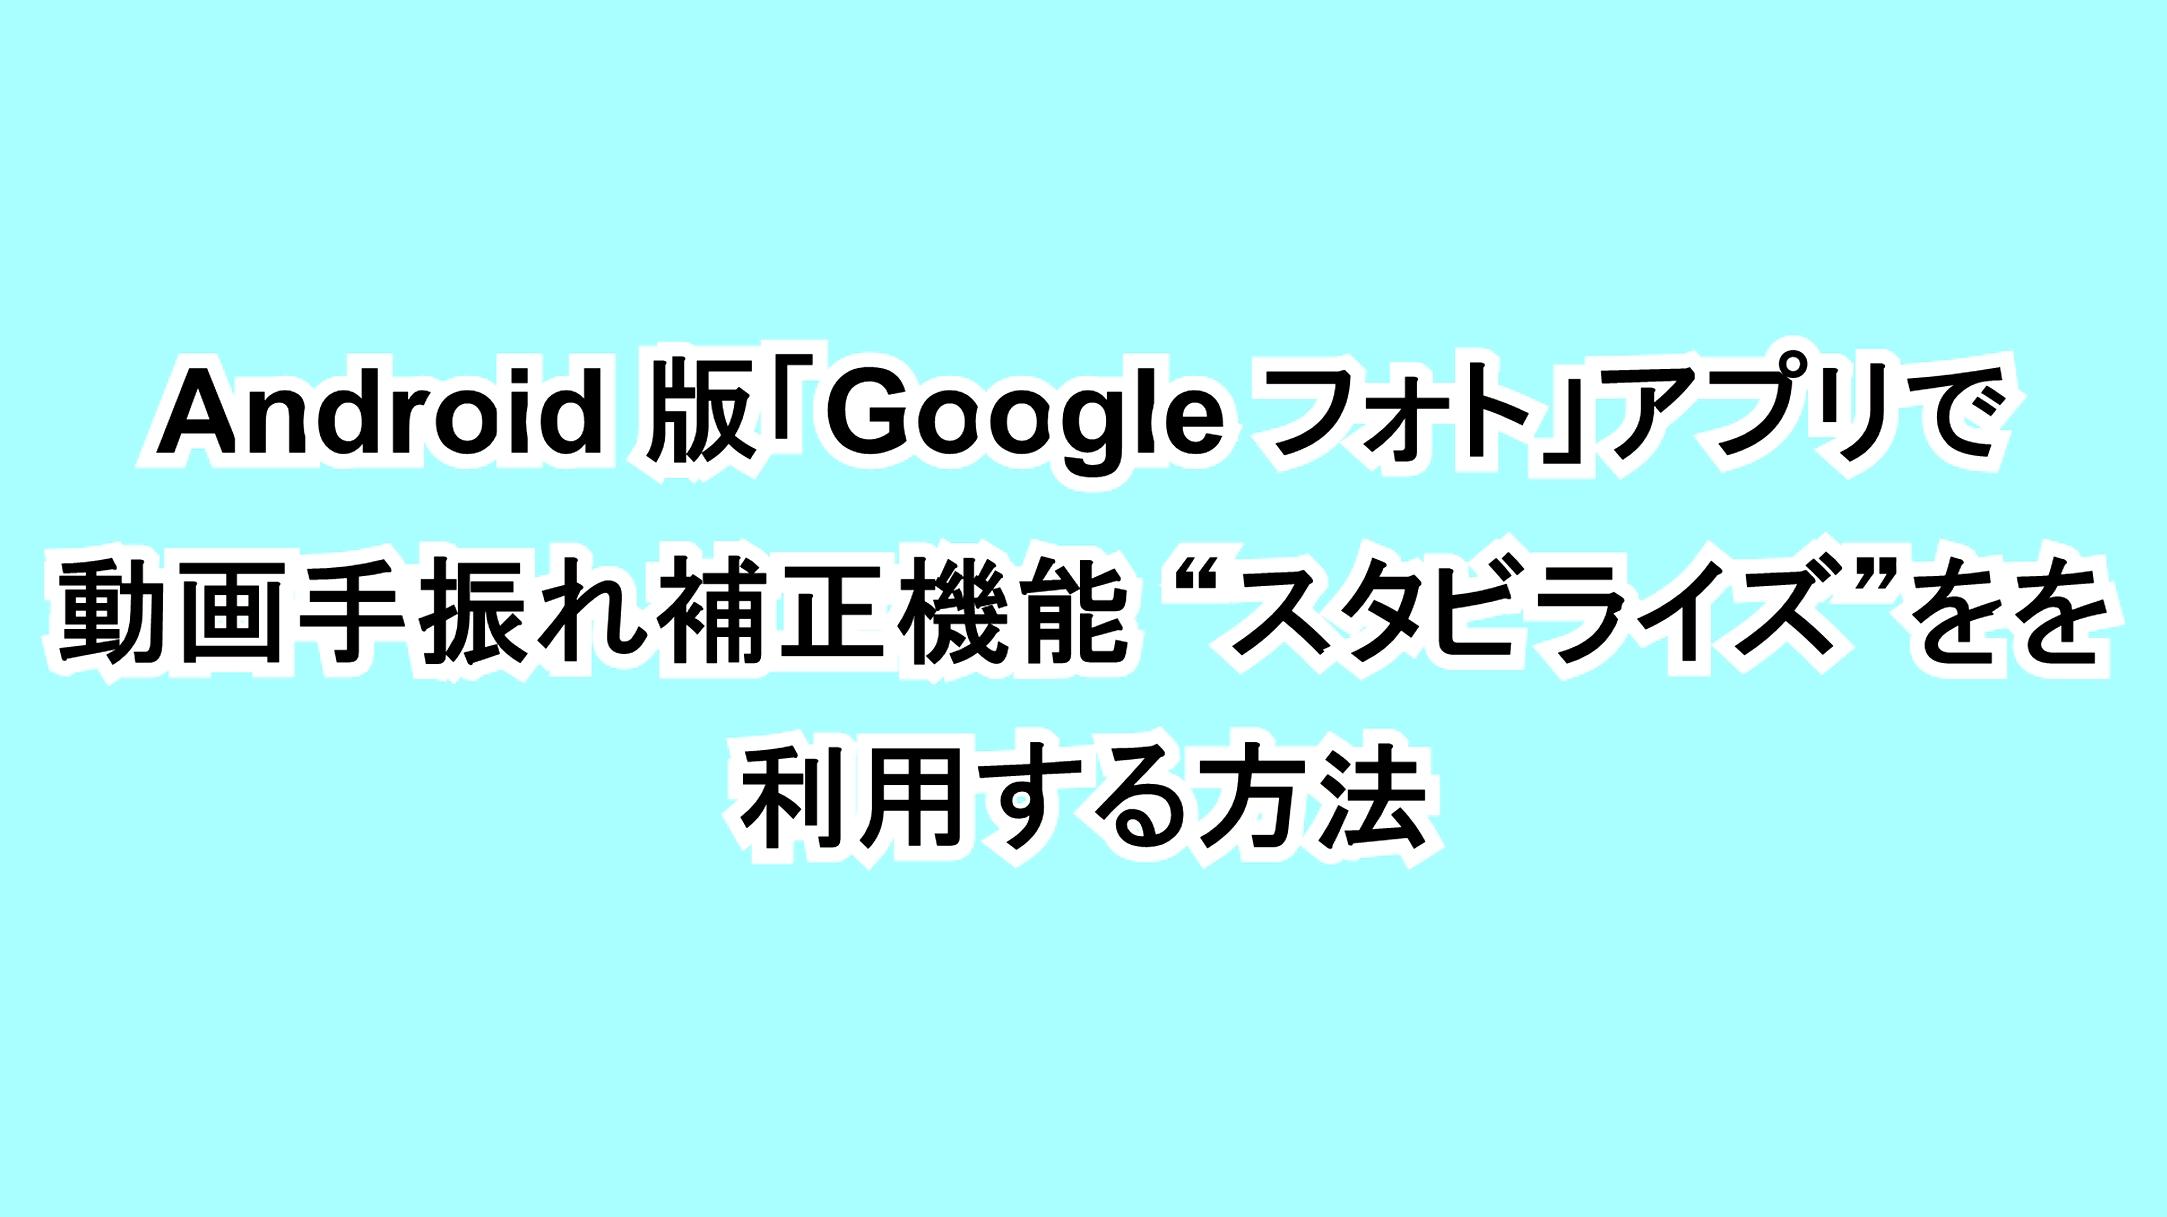 "Android版「Google フォト」アプリで動画手振れ補正機能""スタビライズ""を利用する方法"